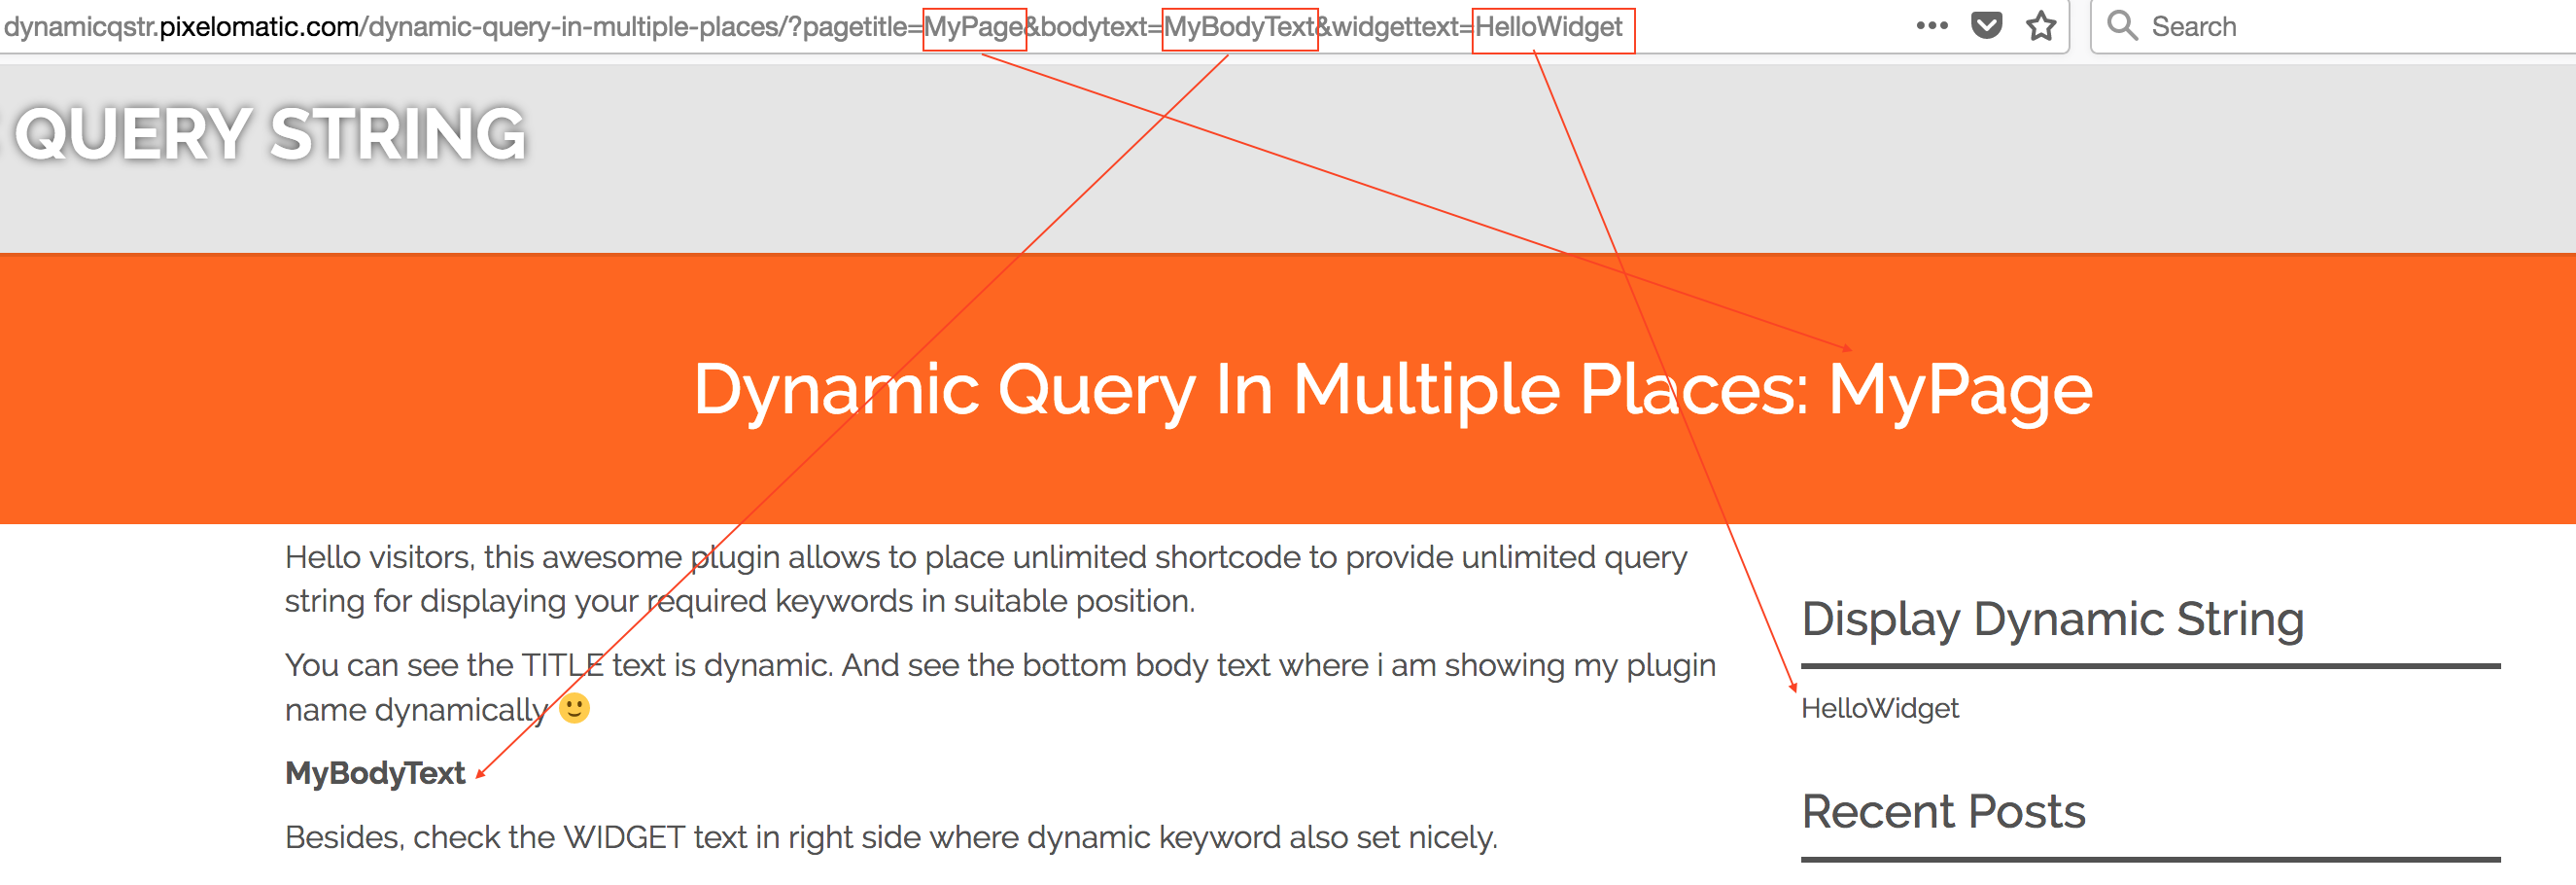 dynamic query string